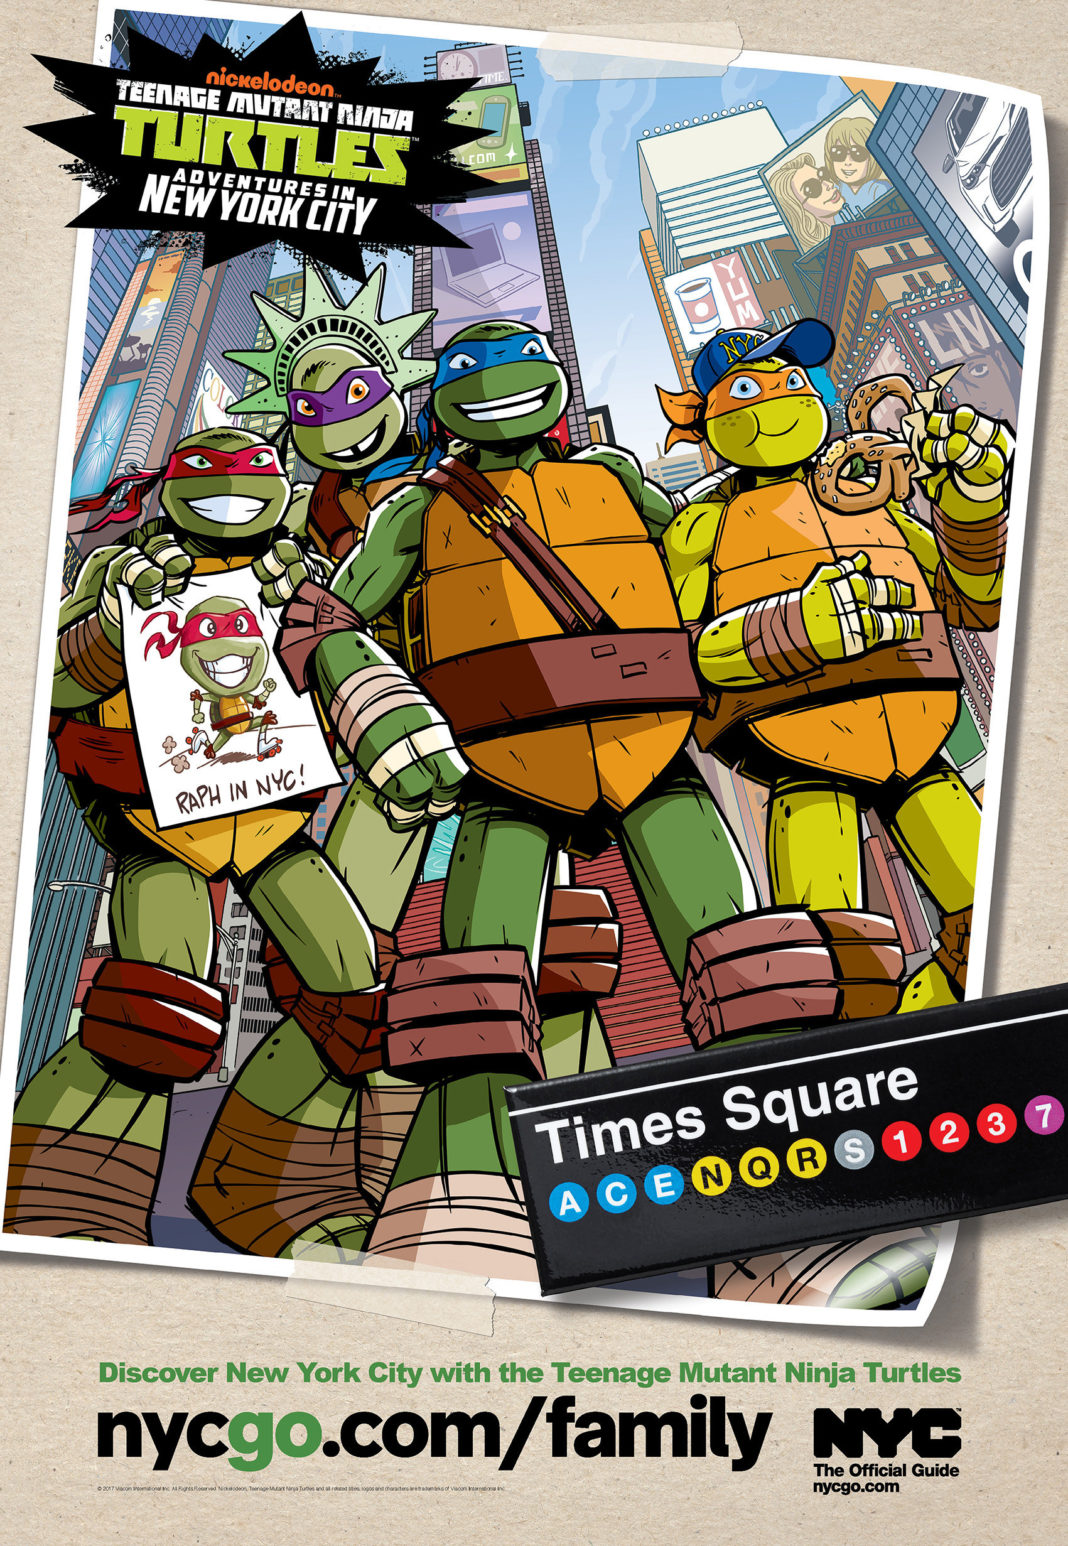 Le tartarughe ninja alla scoperta di new york classtravel